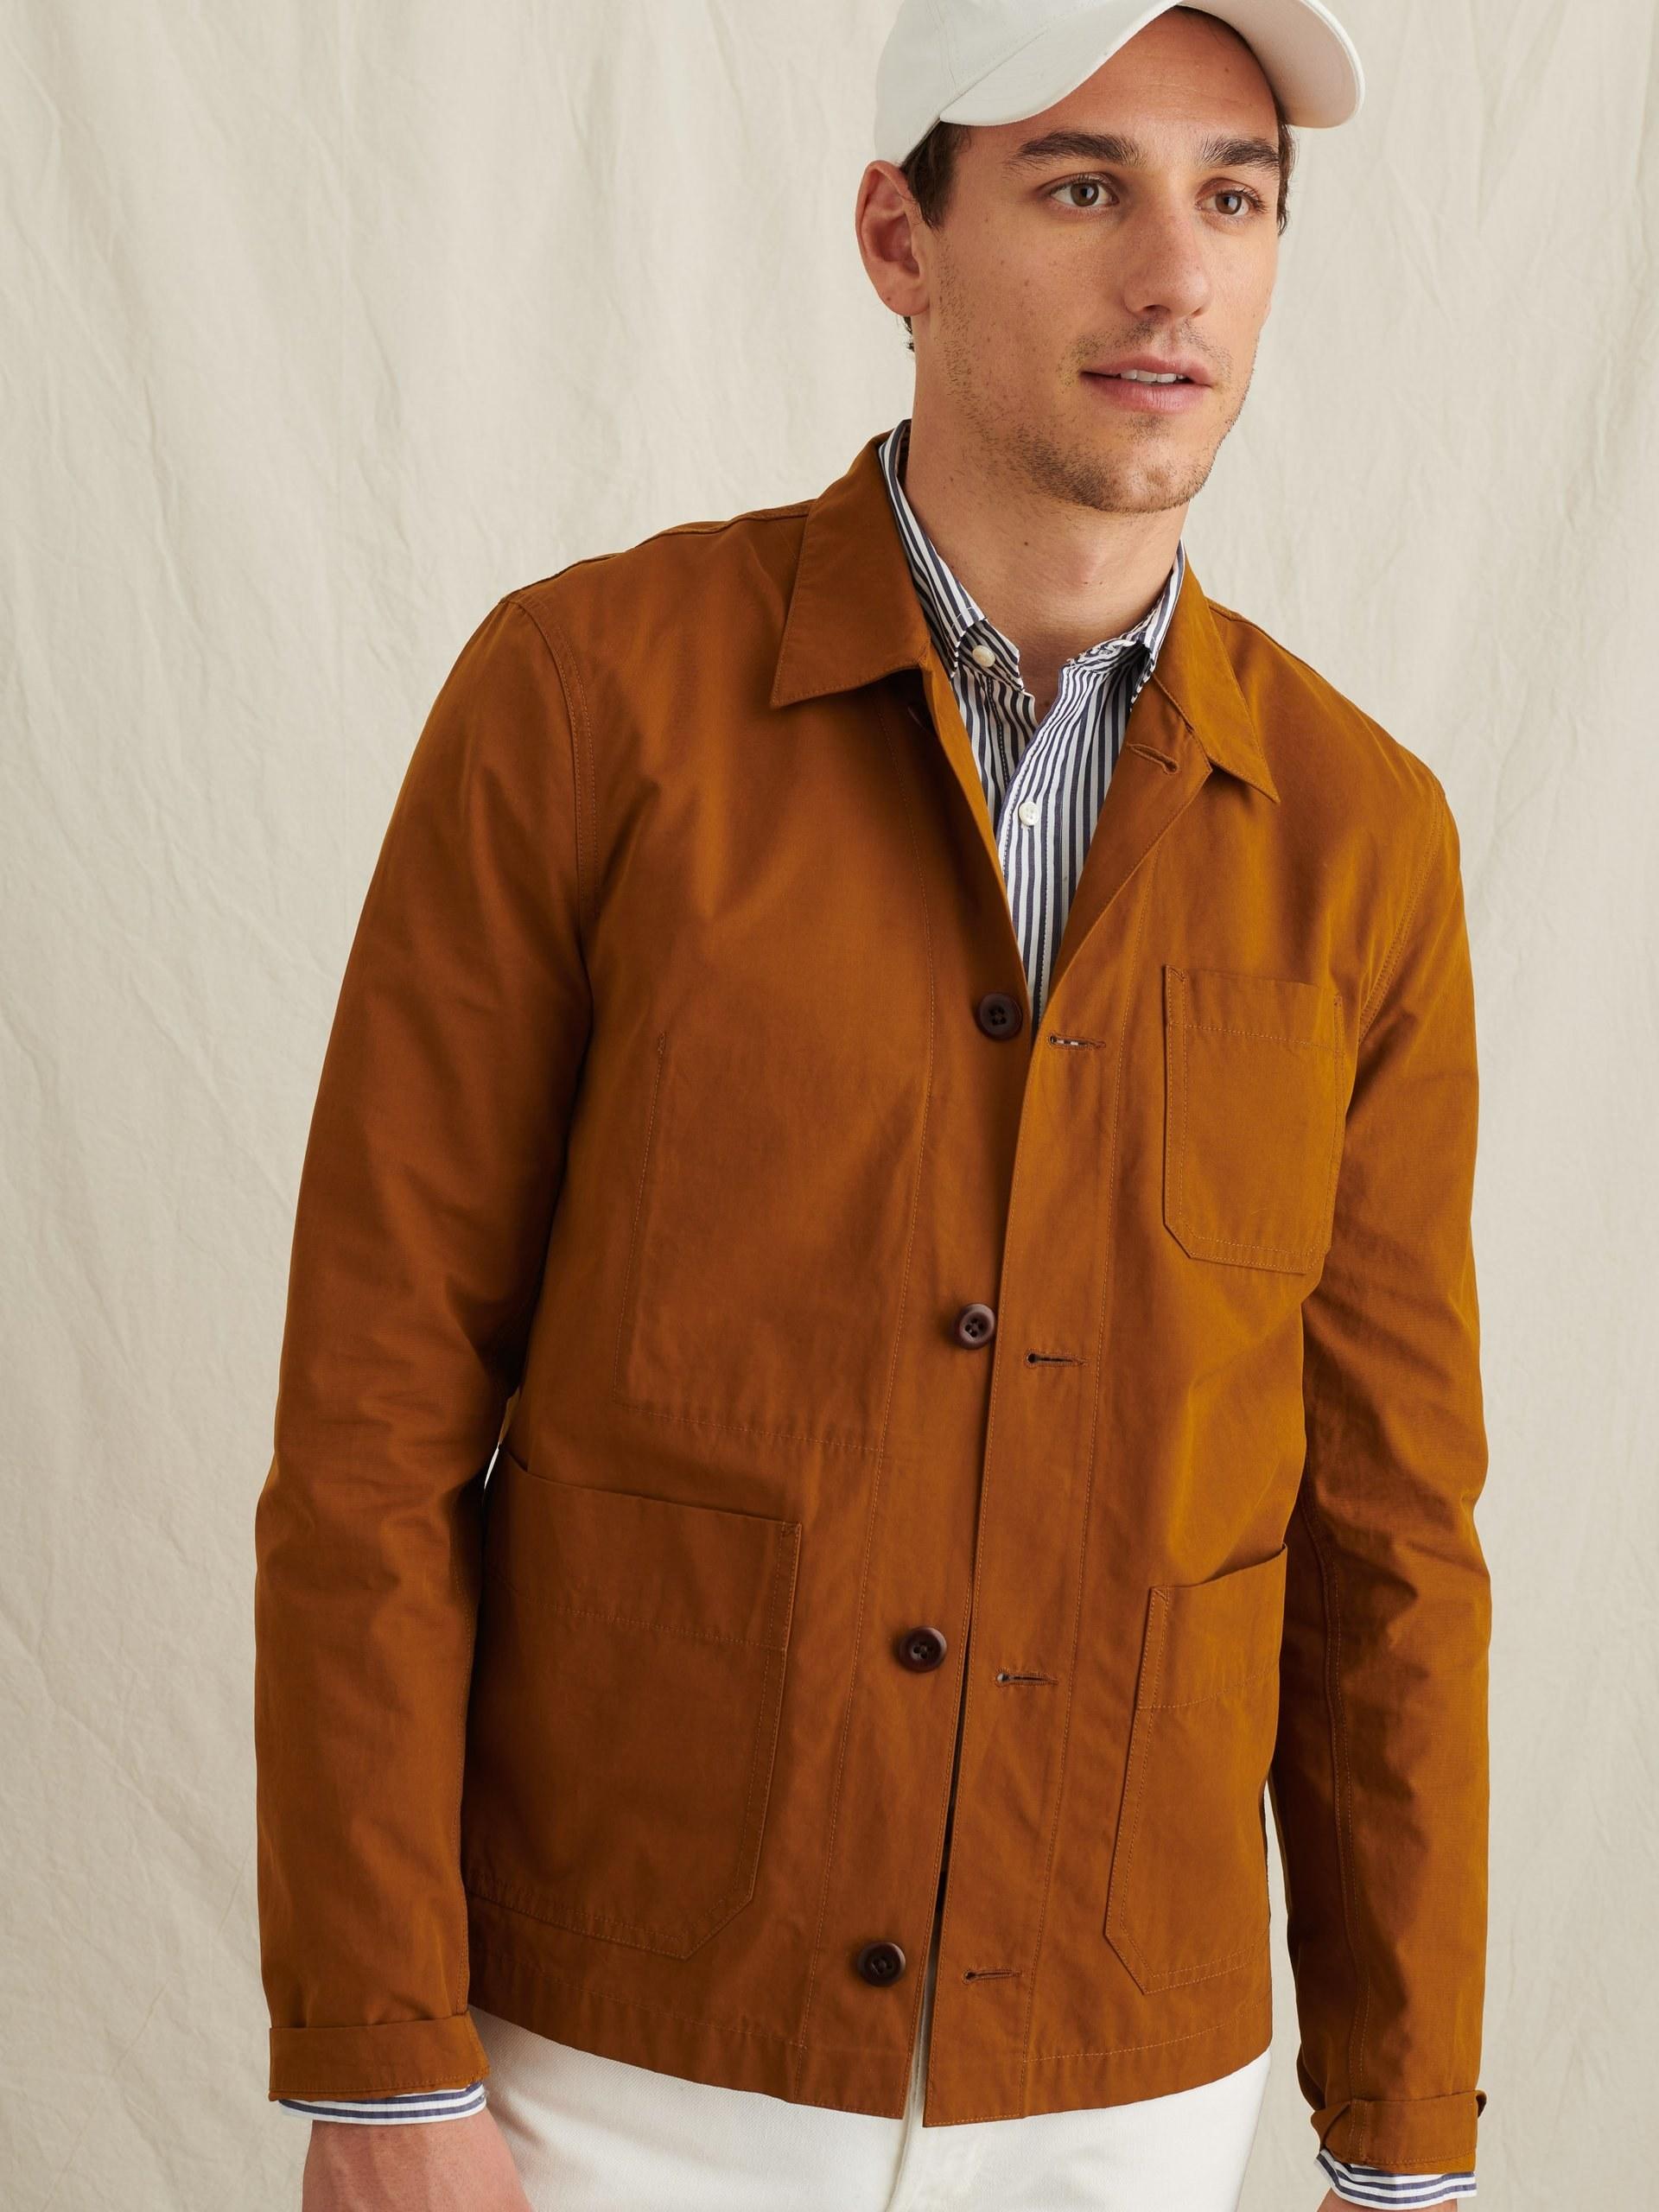 Model wearing Alex Mill garment-dyed work jacket in toffee